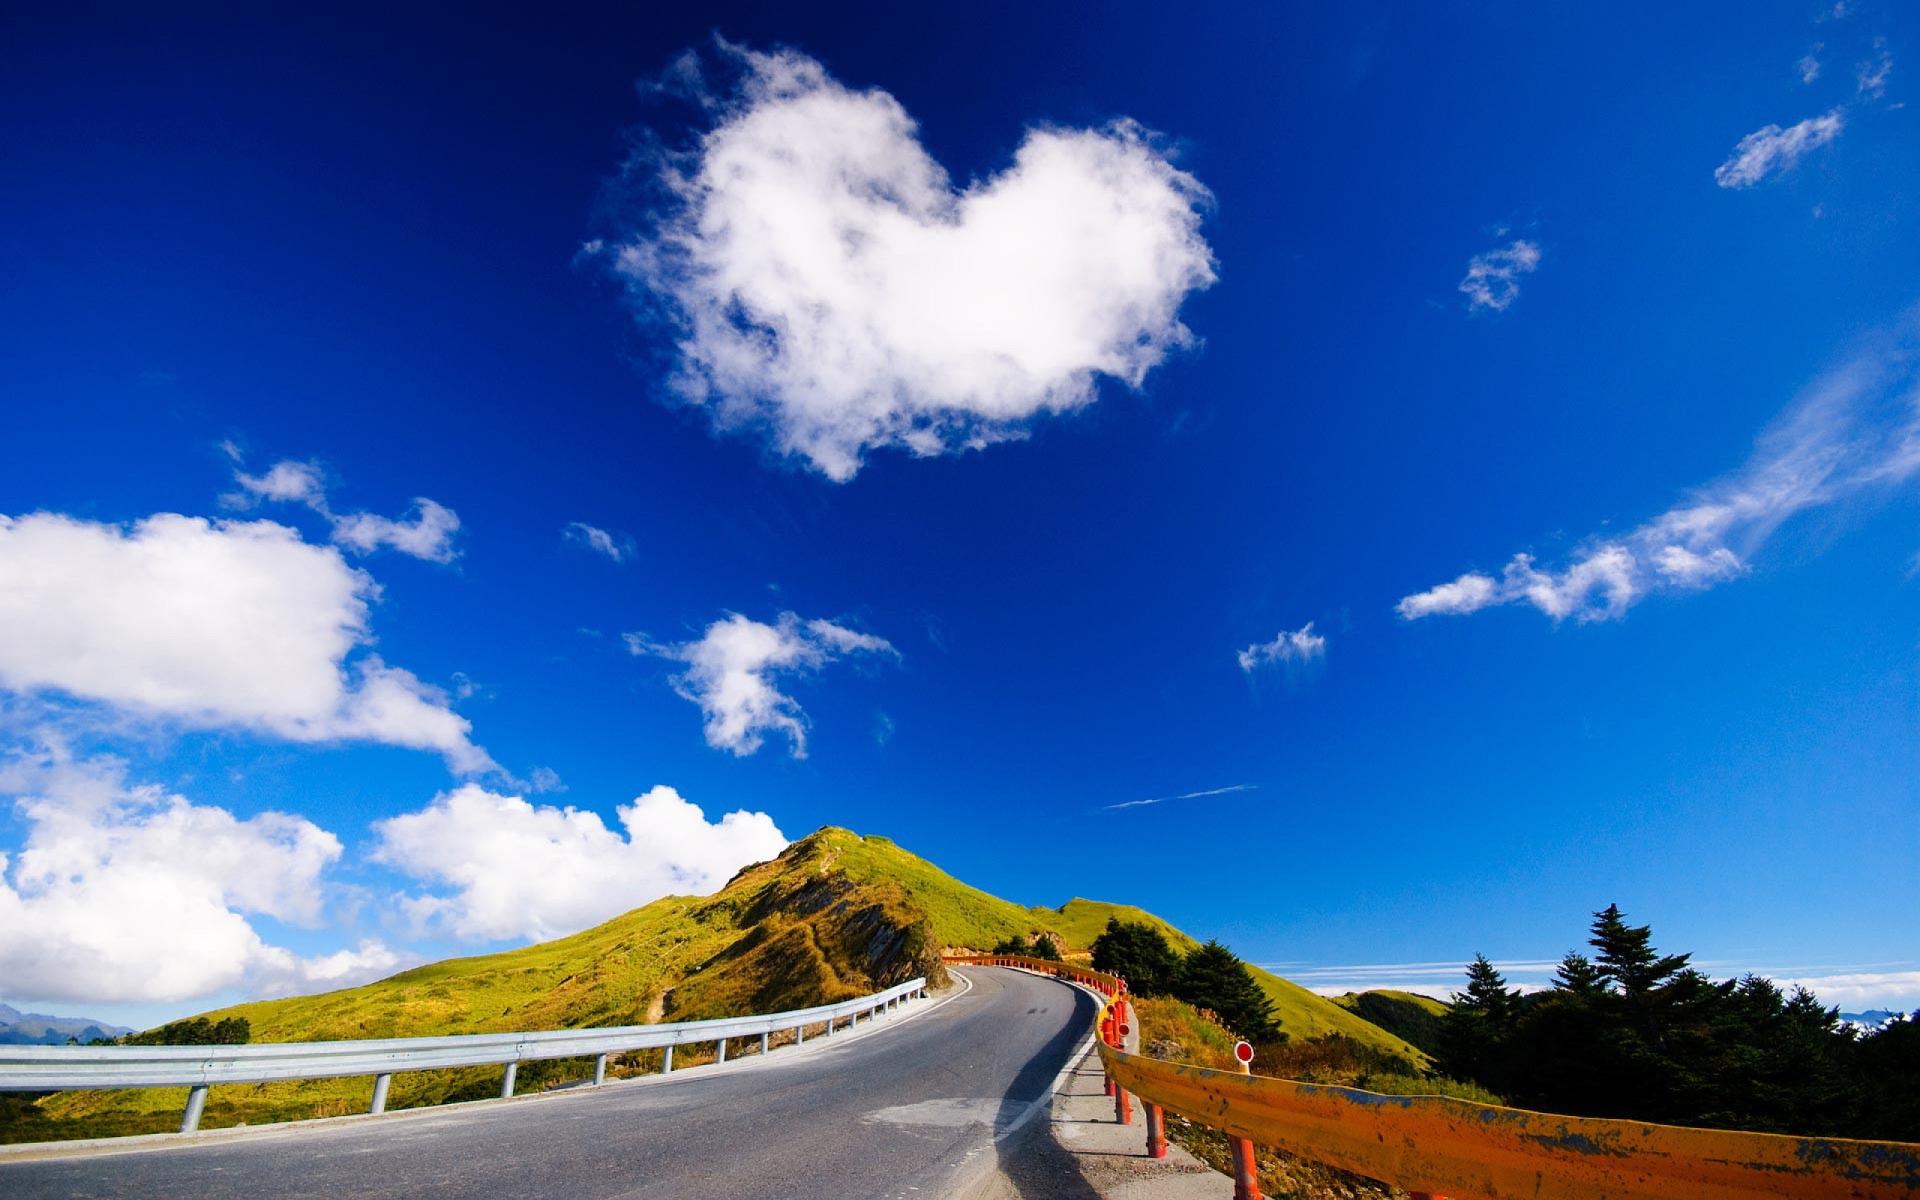 Love Cloud Mountain